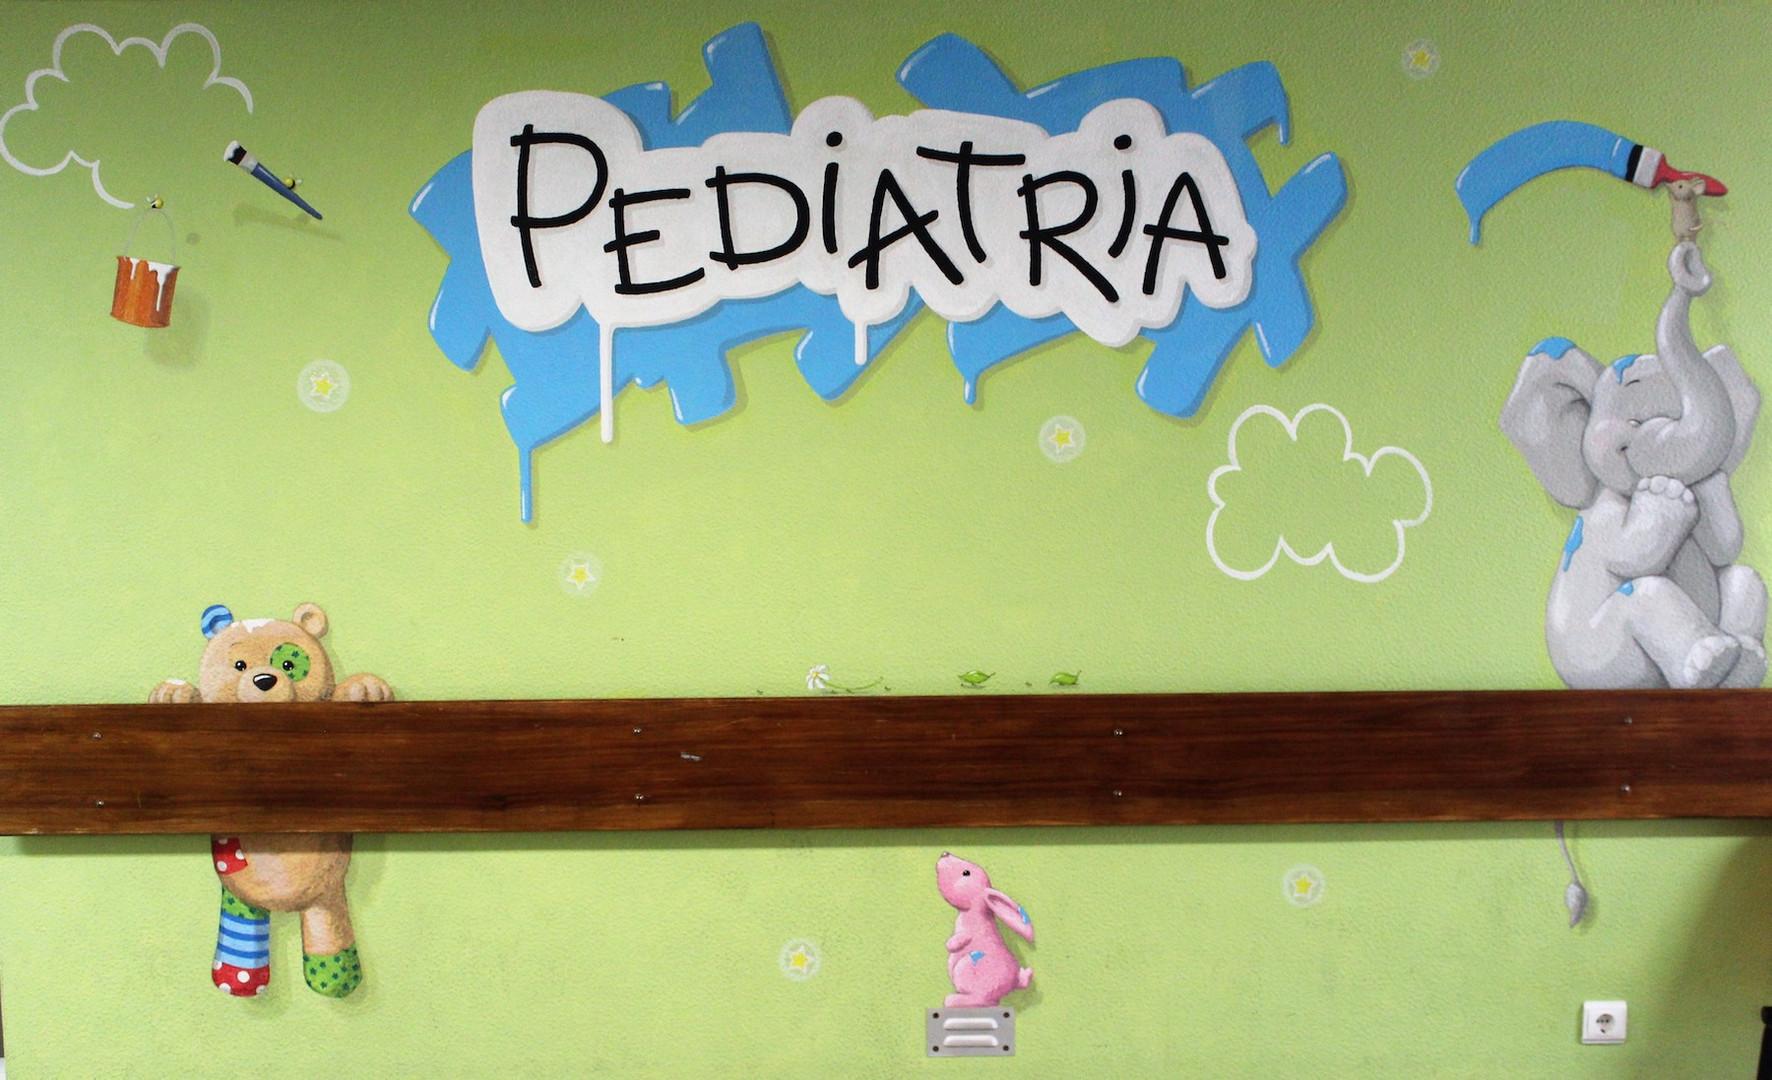 apvc-pediatria.JPG